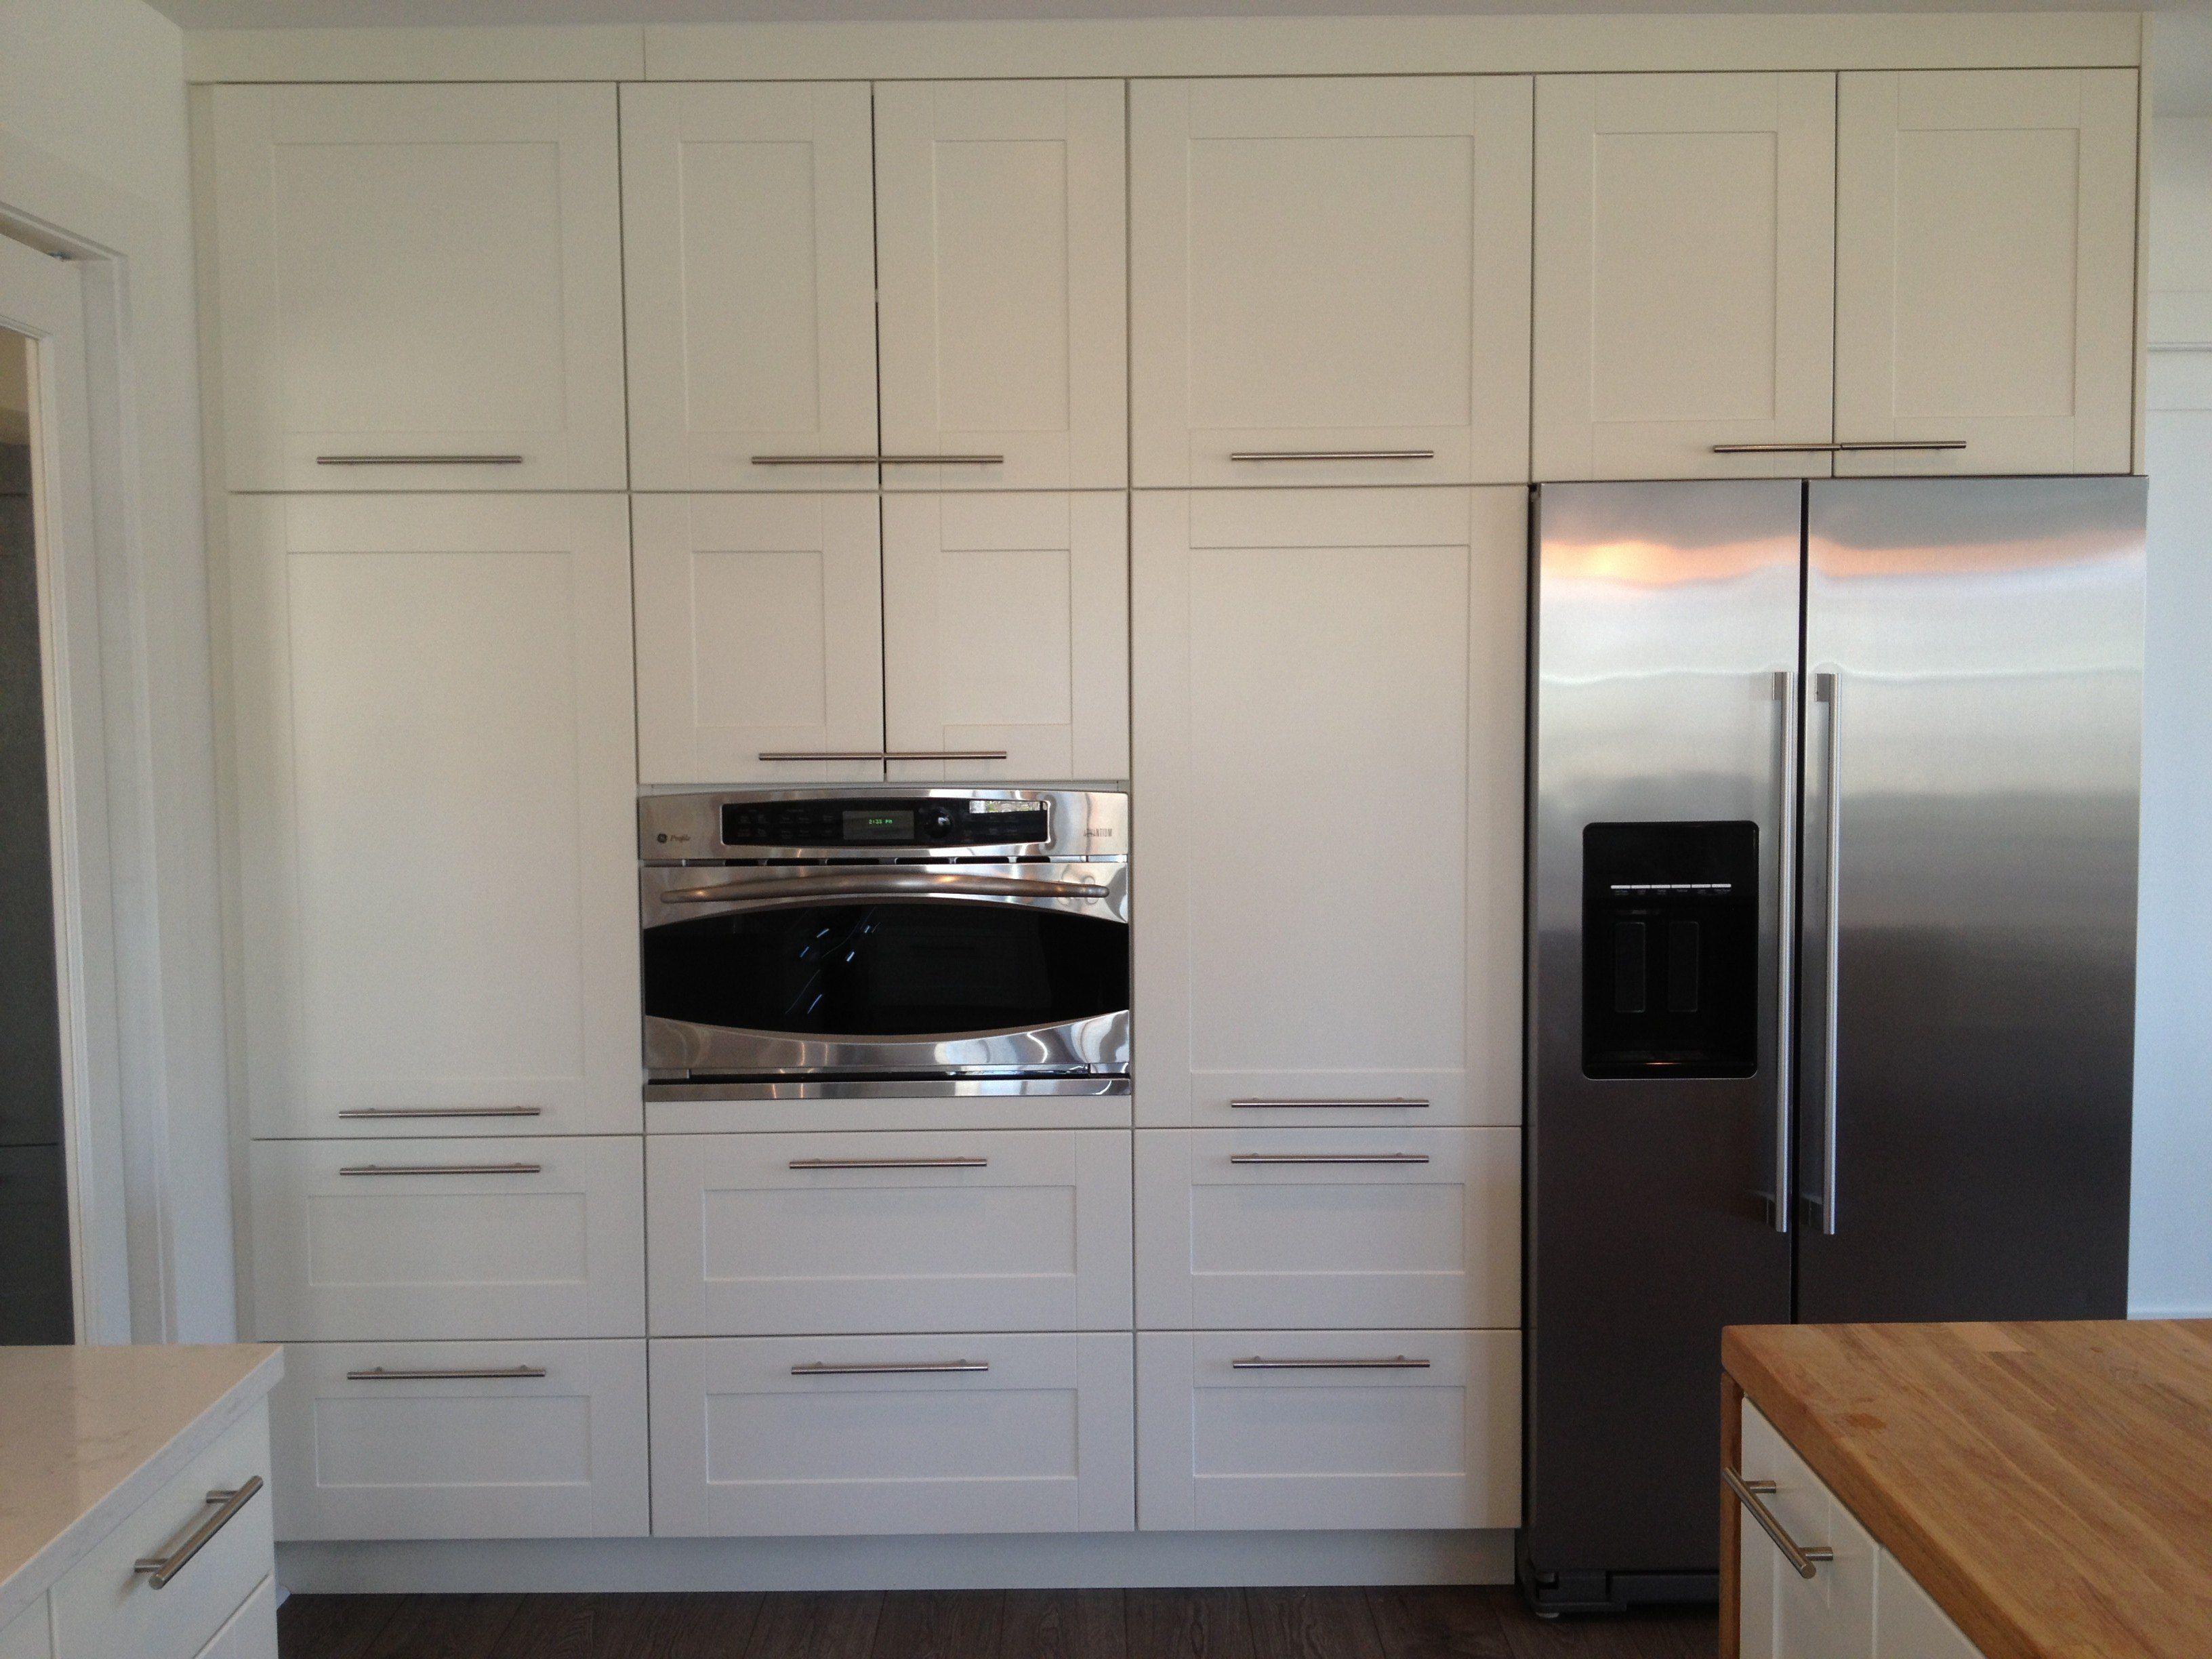 Finished Adel White Kitchen   IKEA FANS   Kitchen wall units ...